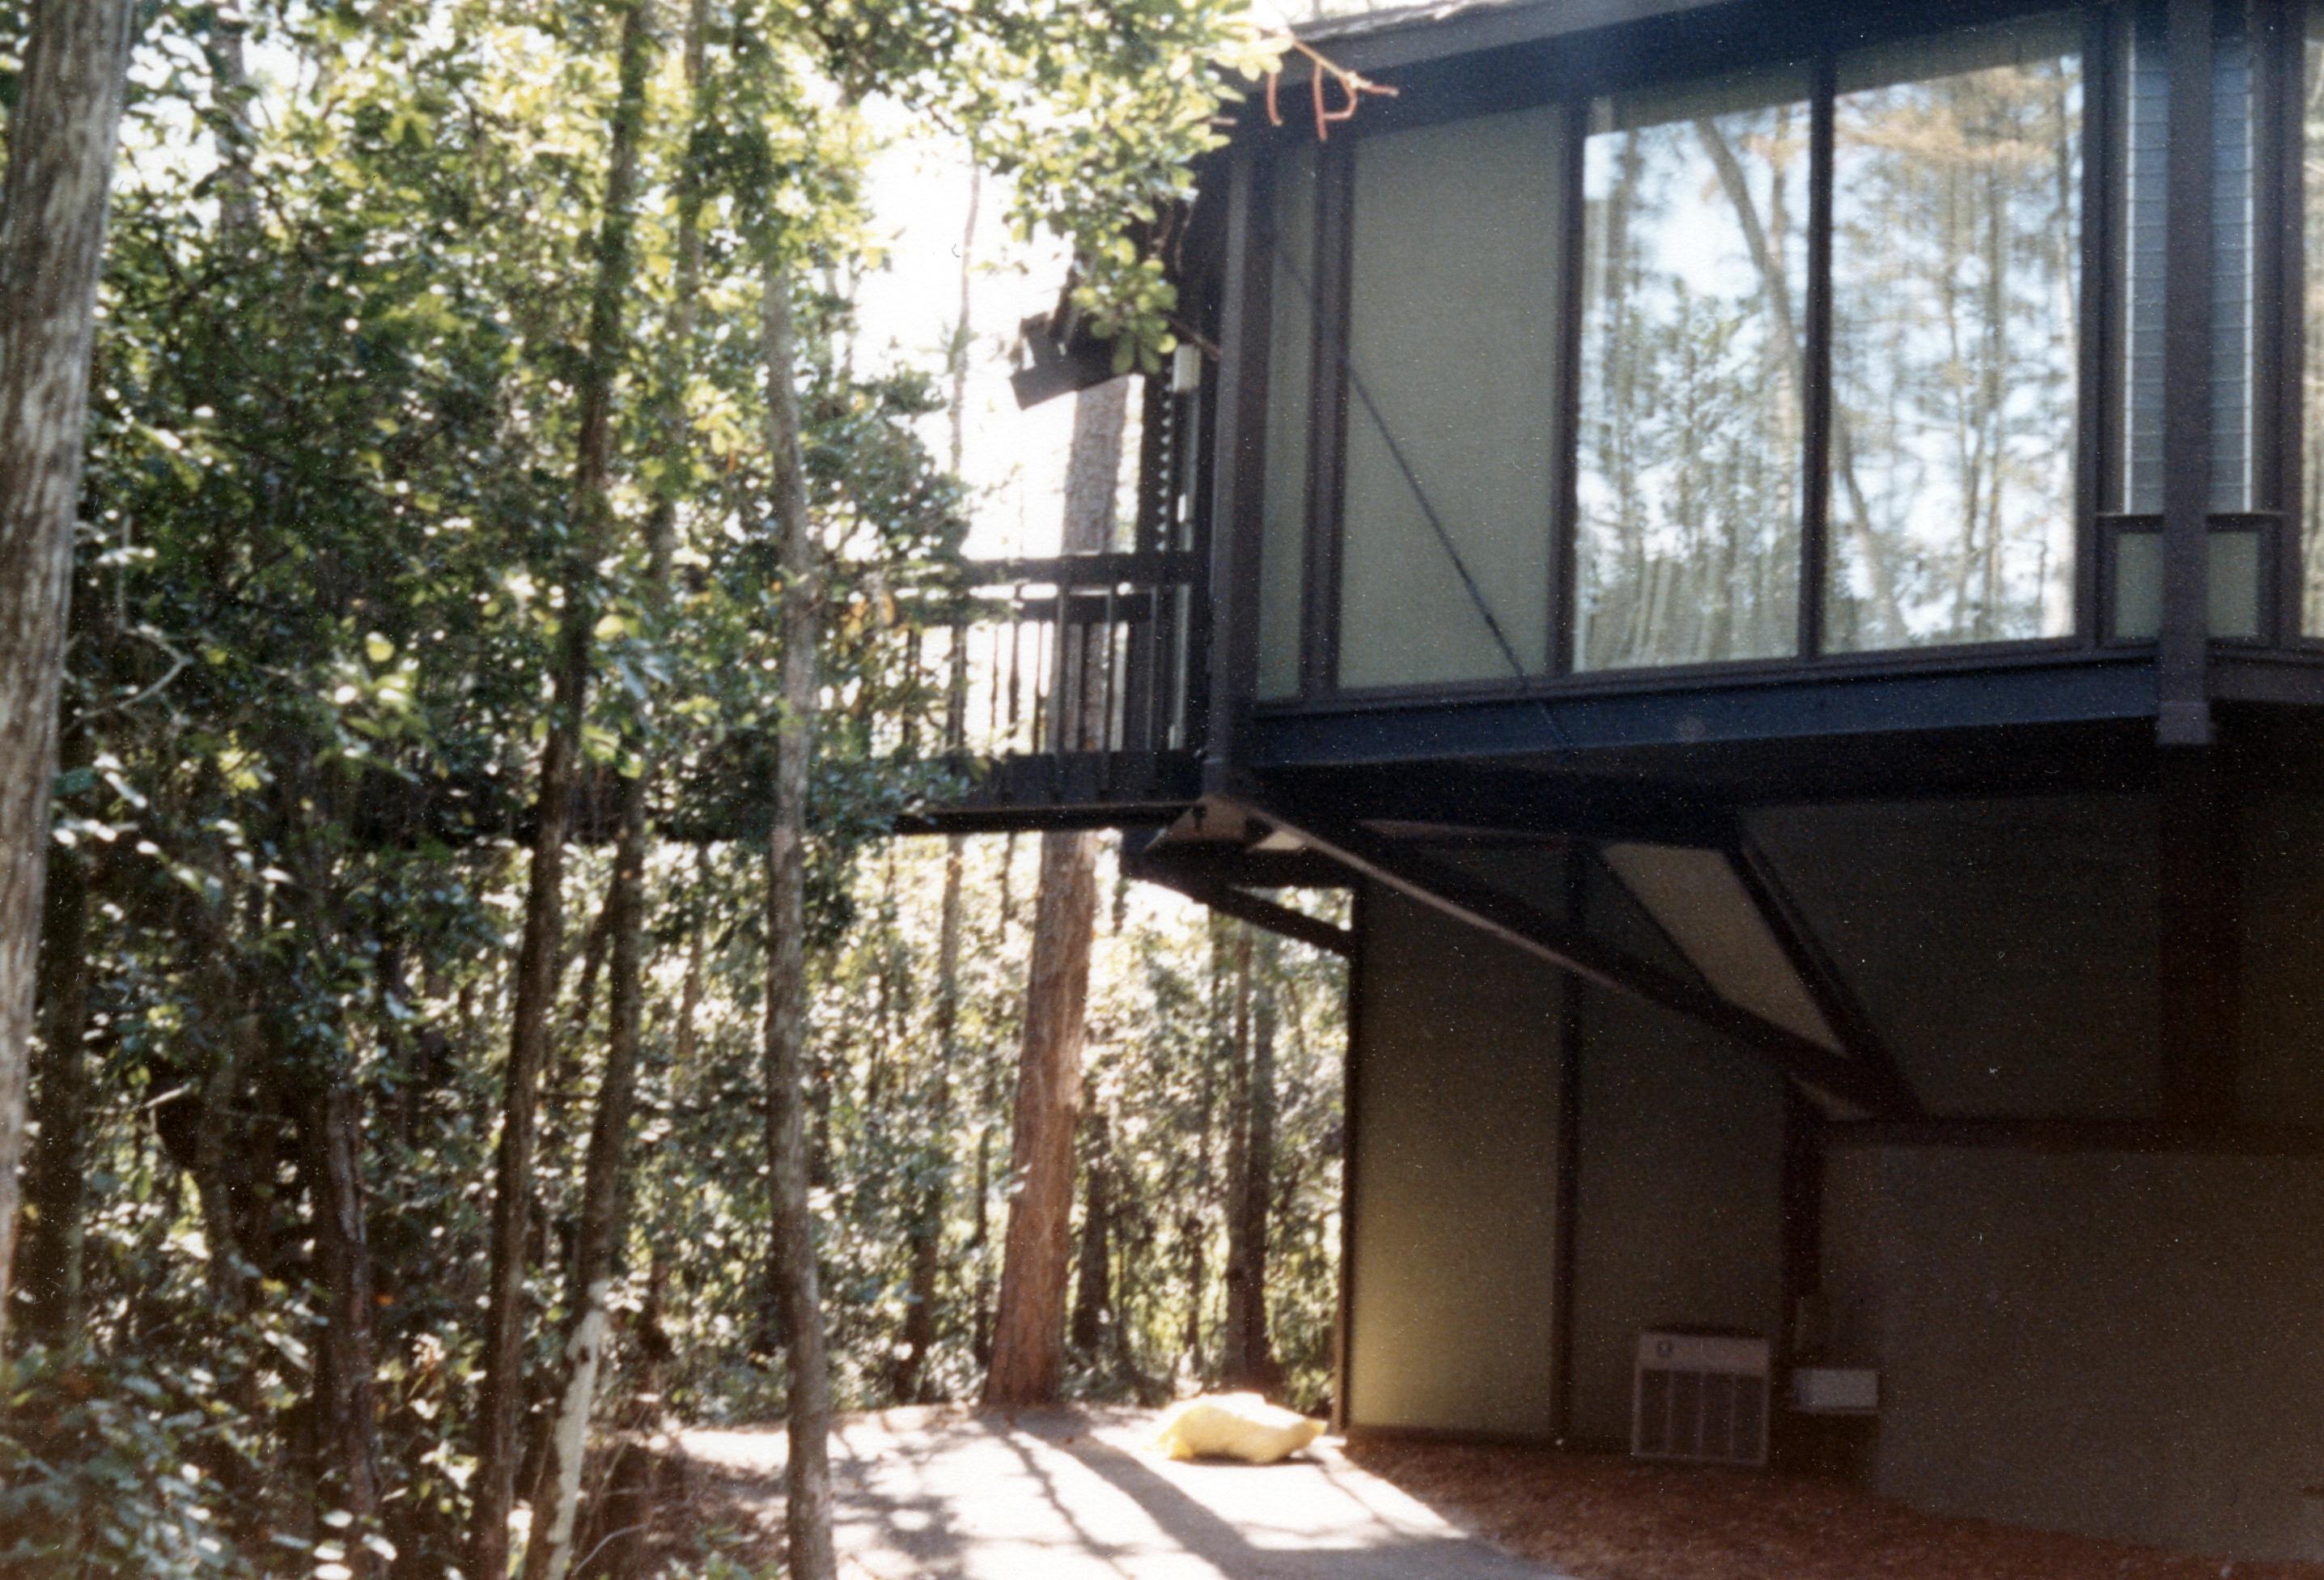 walt disney world treehouse villa 433 37 years later retrowdw